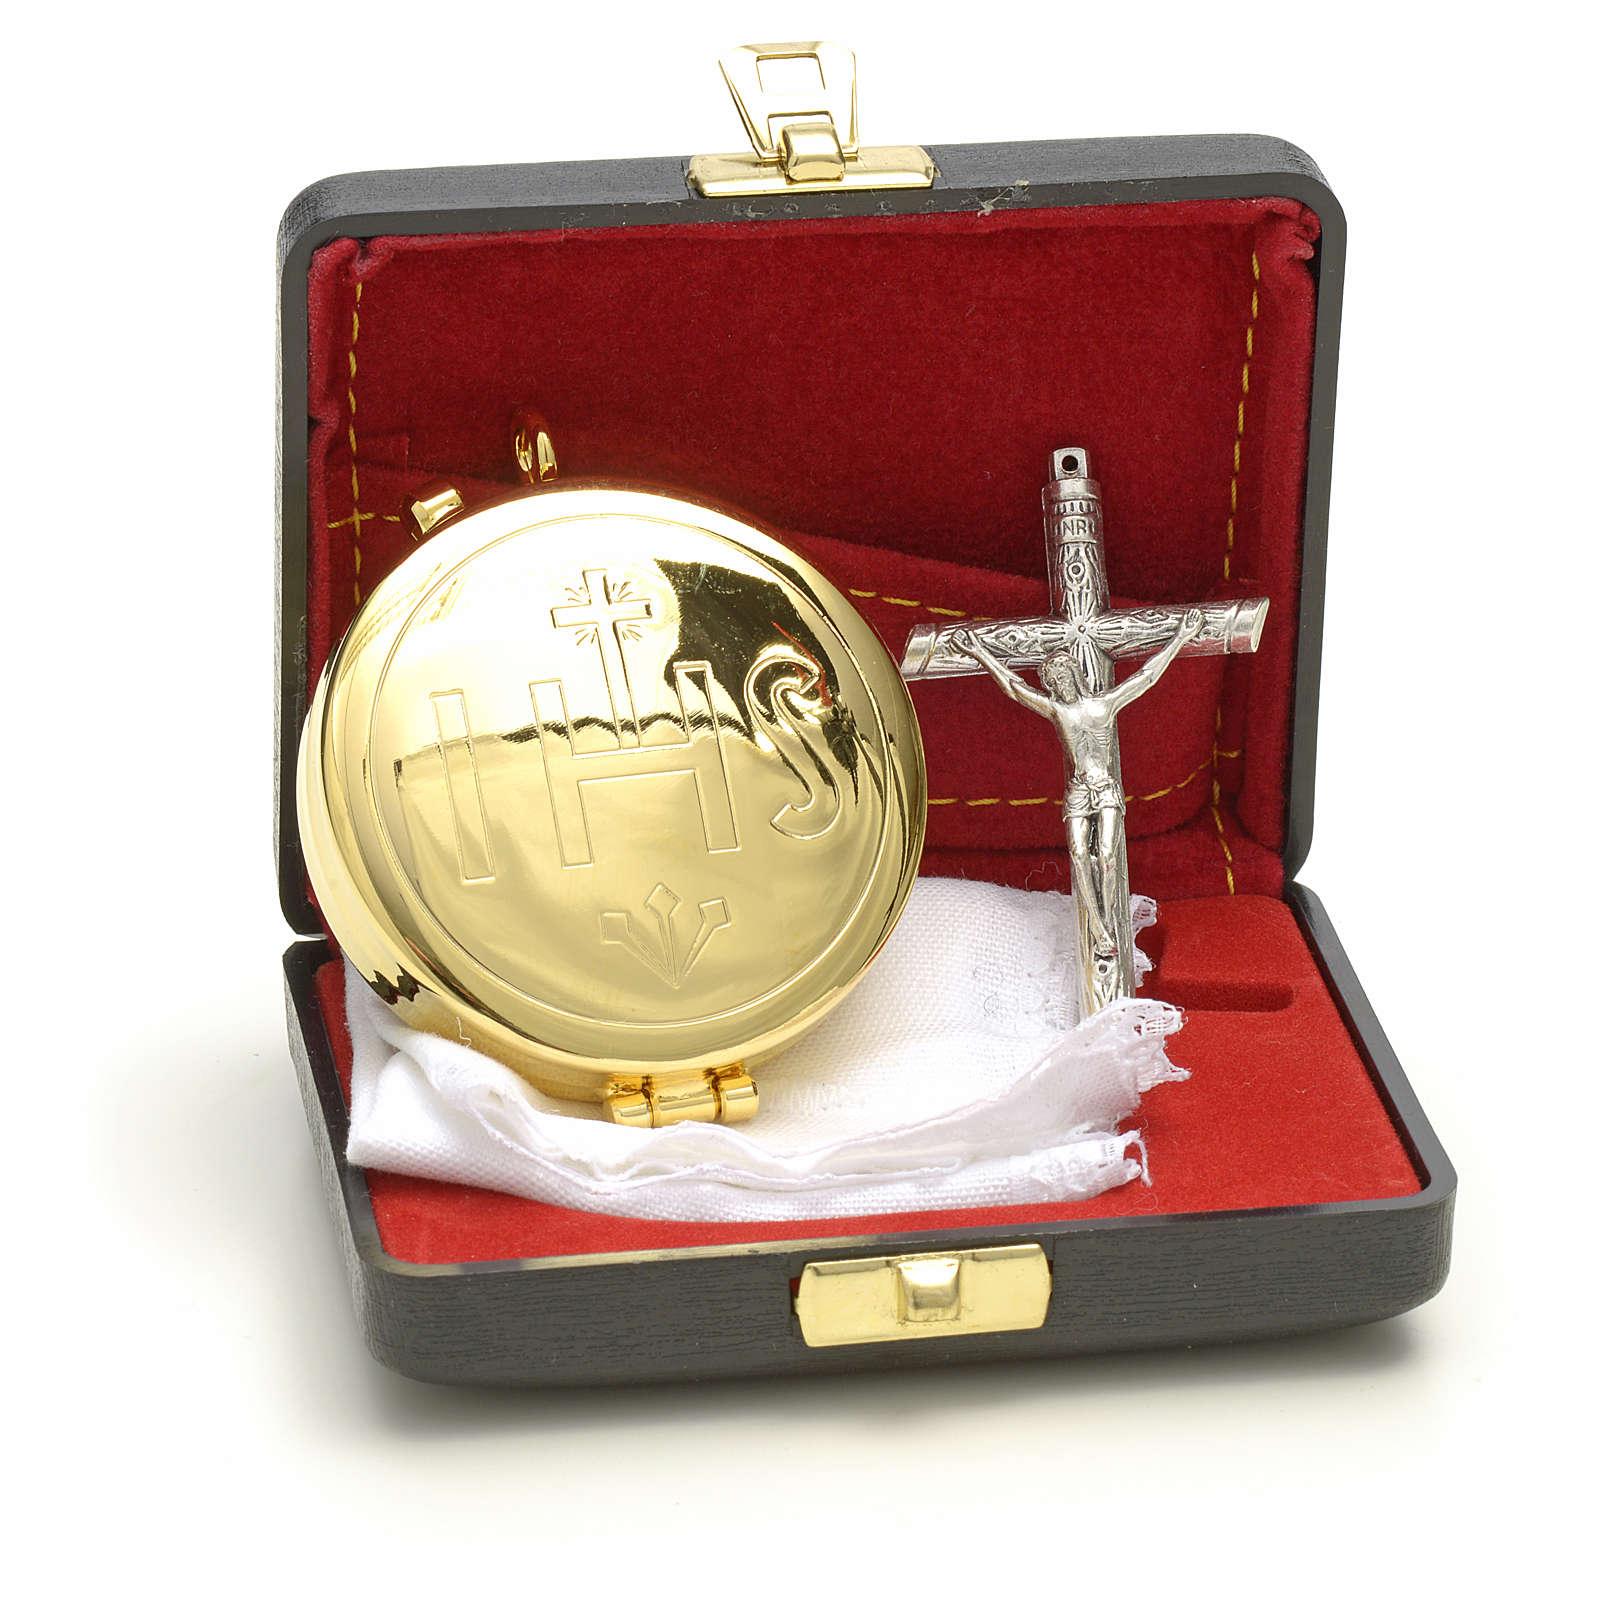 Astuccio rigido con teca IHS croce purificatoio 3